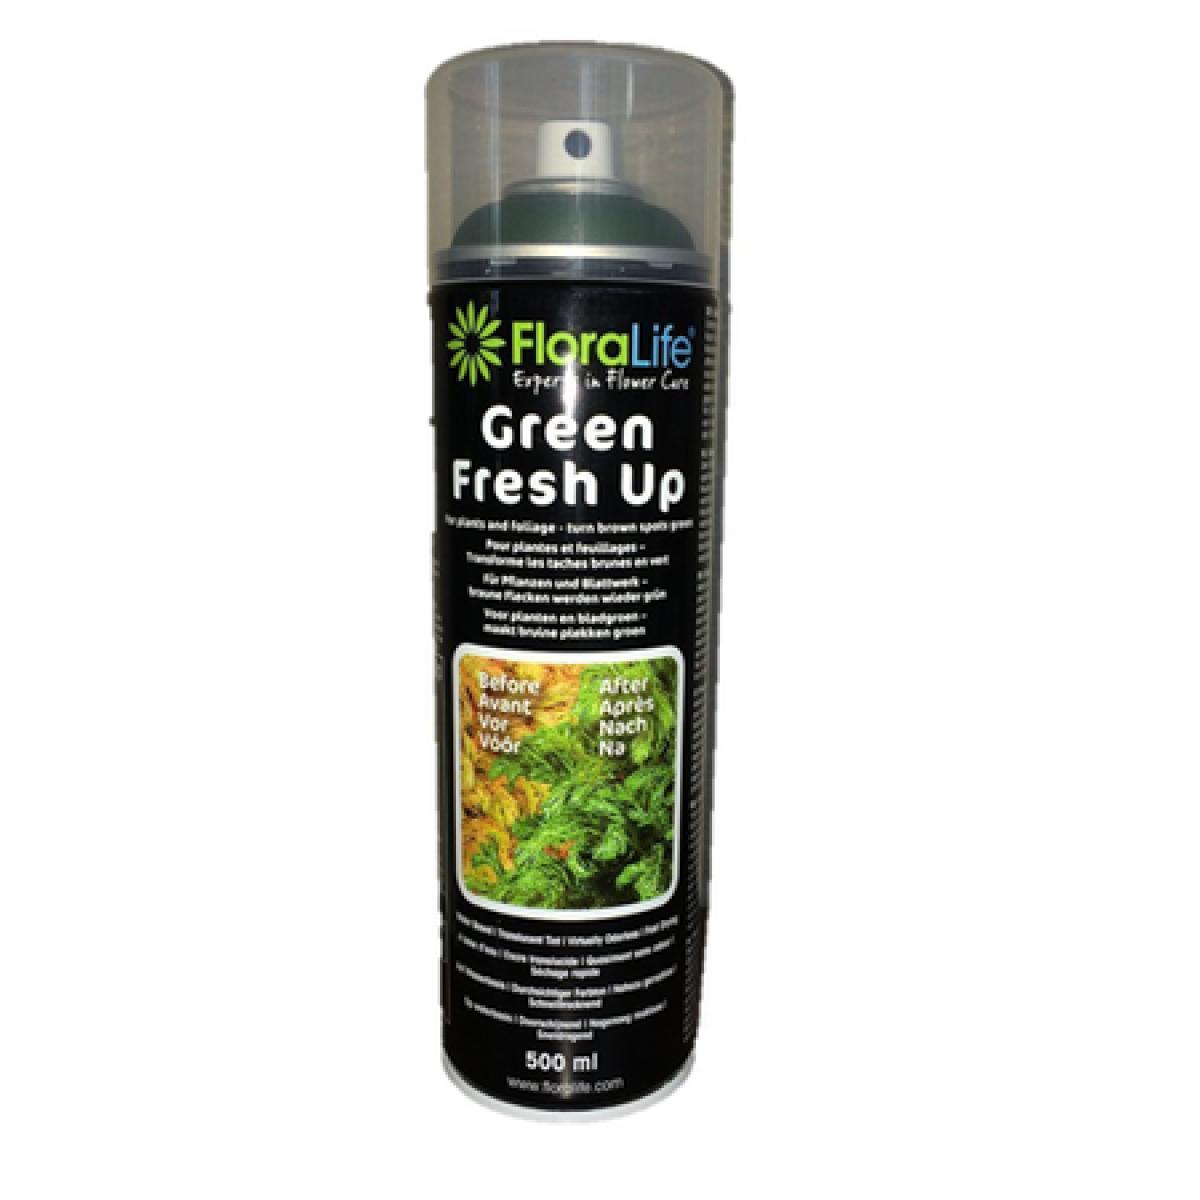 1501 Floralife Green Fresh Up Dark Green 500ml - 1 No